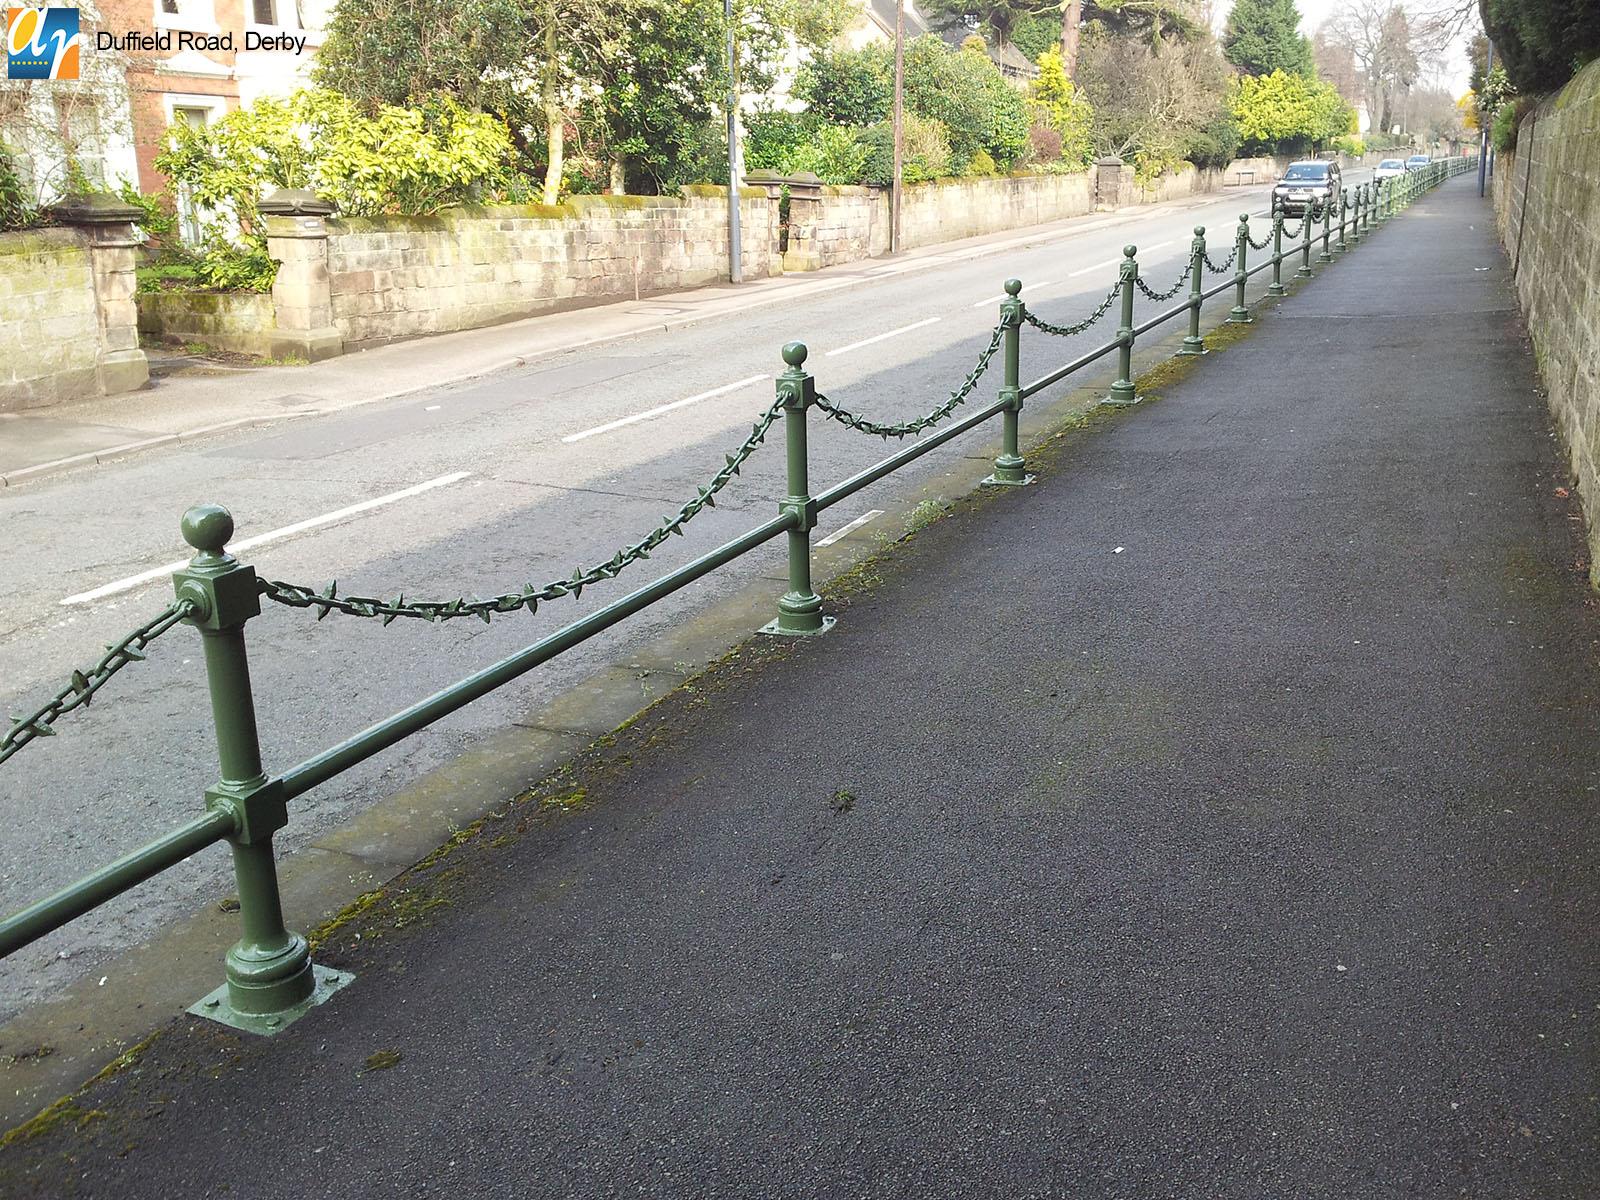 Duffield Road